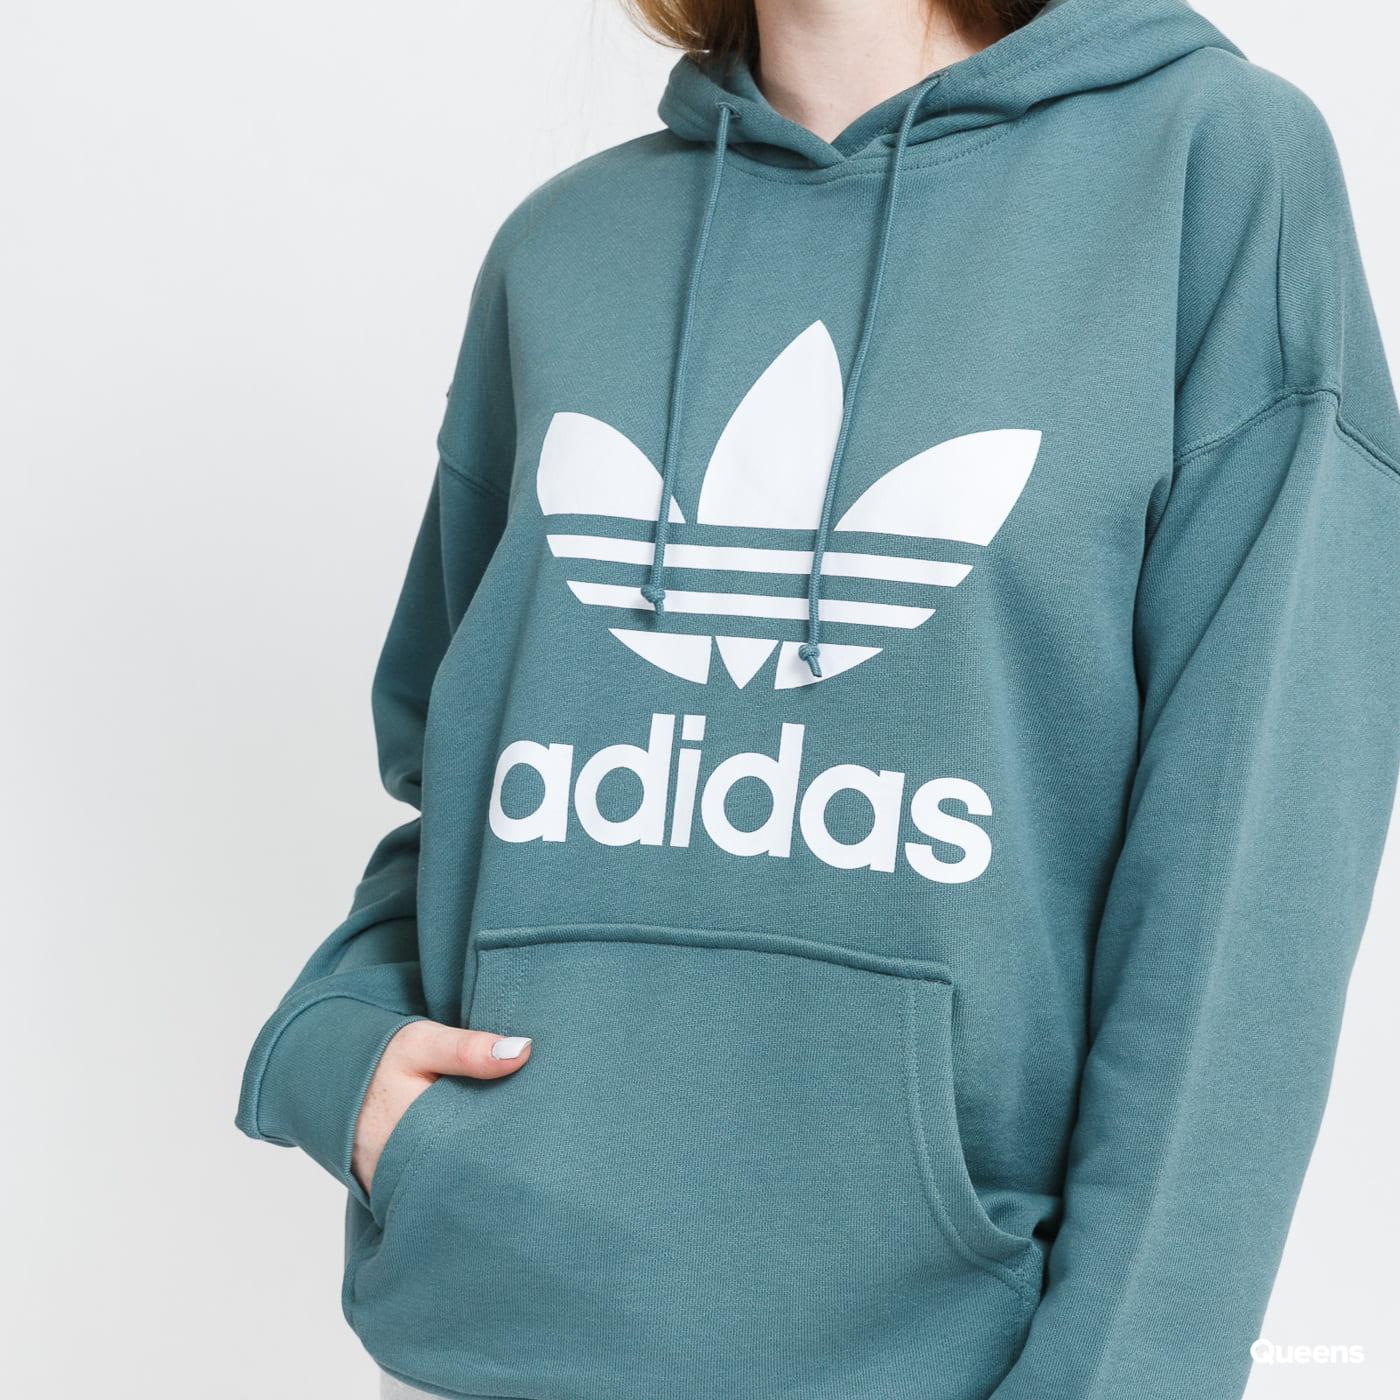 adidas Originals Adicolor Trefoil Hoodie green